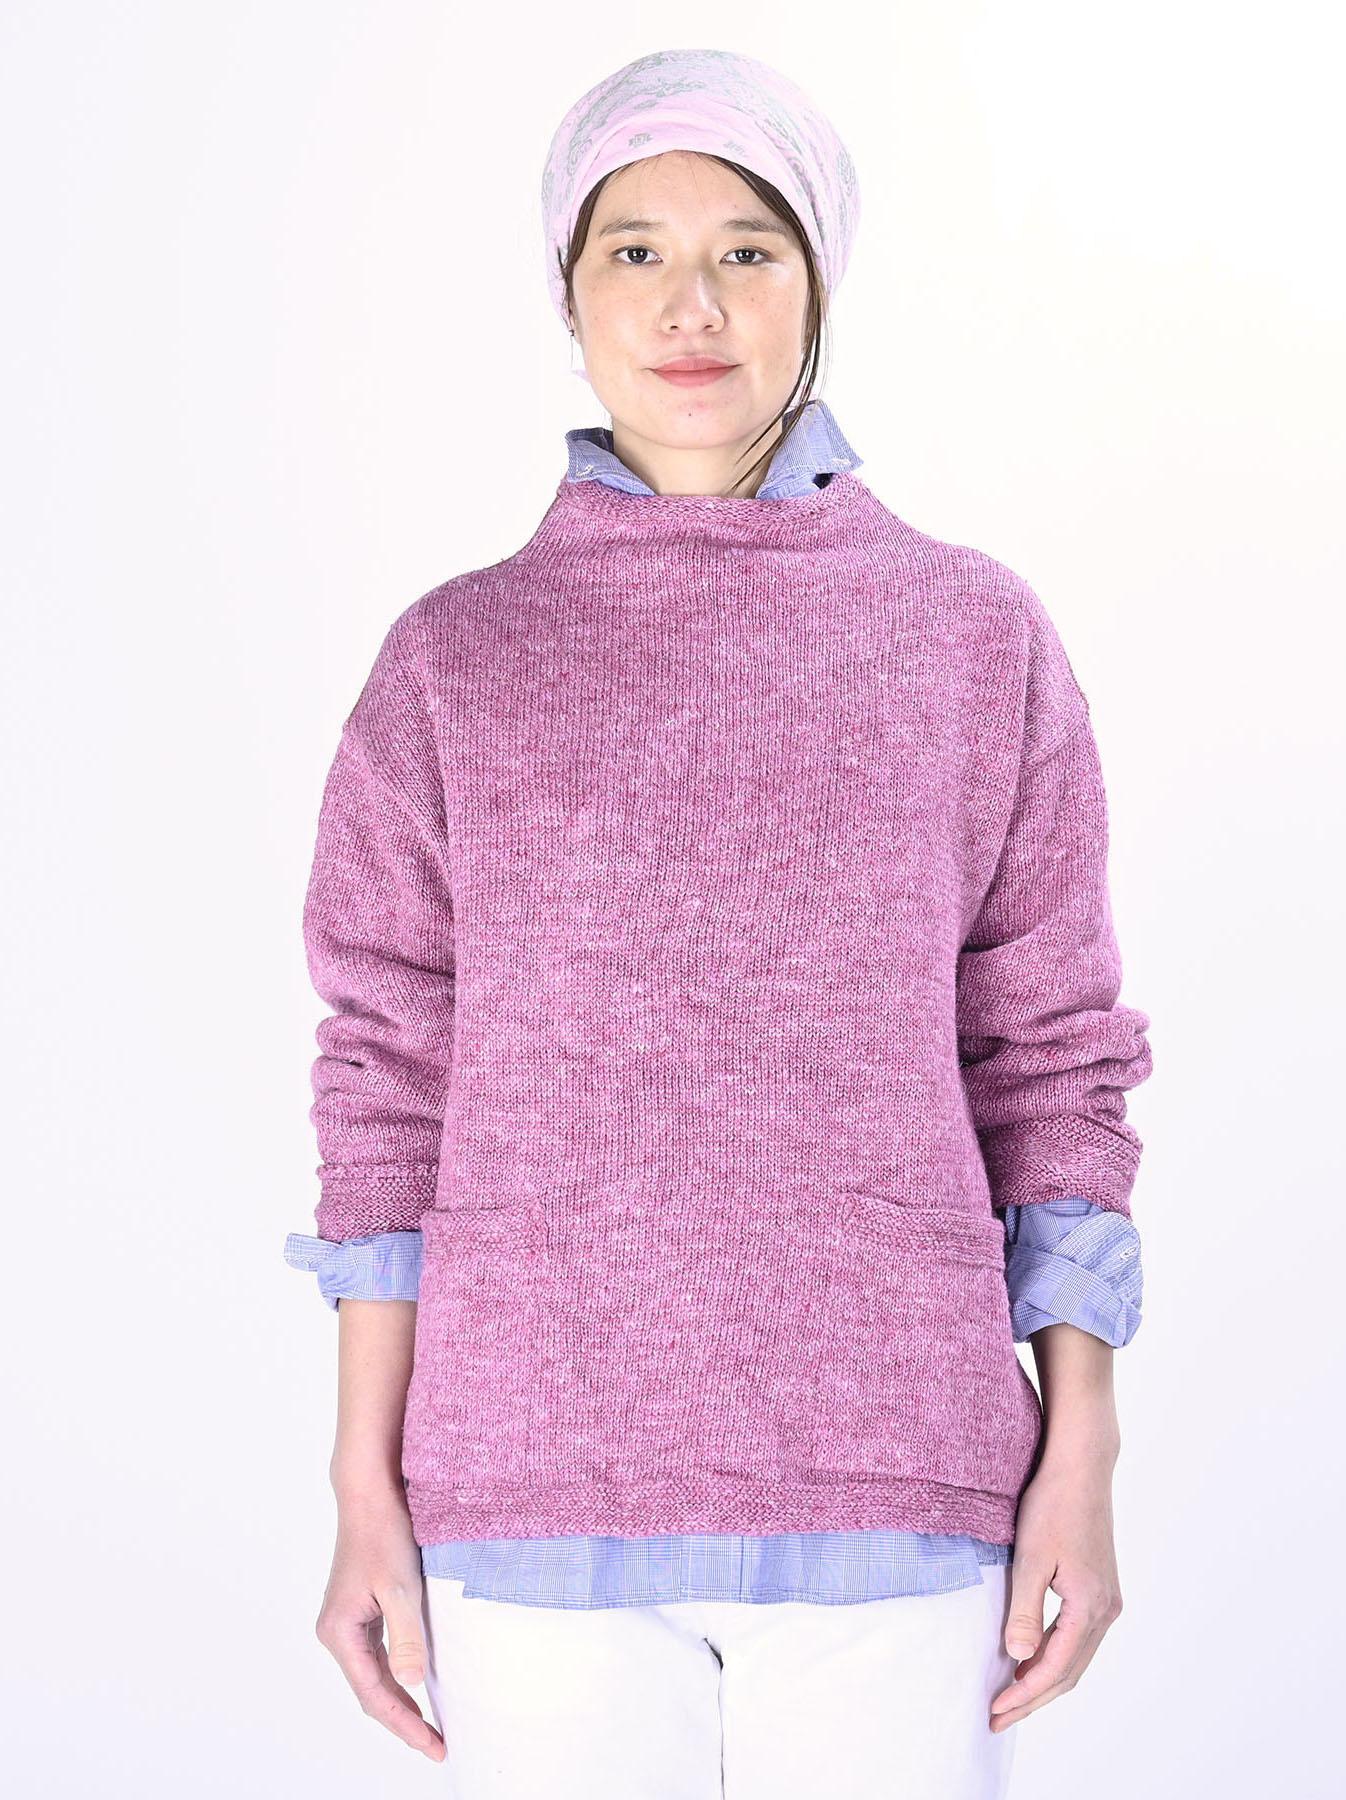 WH Linen Tweed Knit-sew 908 Umahiko Sweater (0321)-6